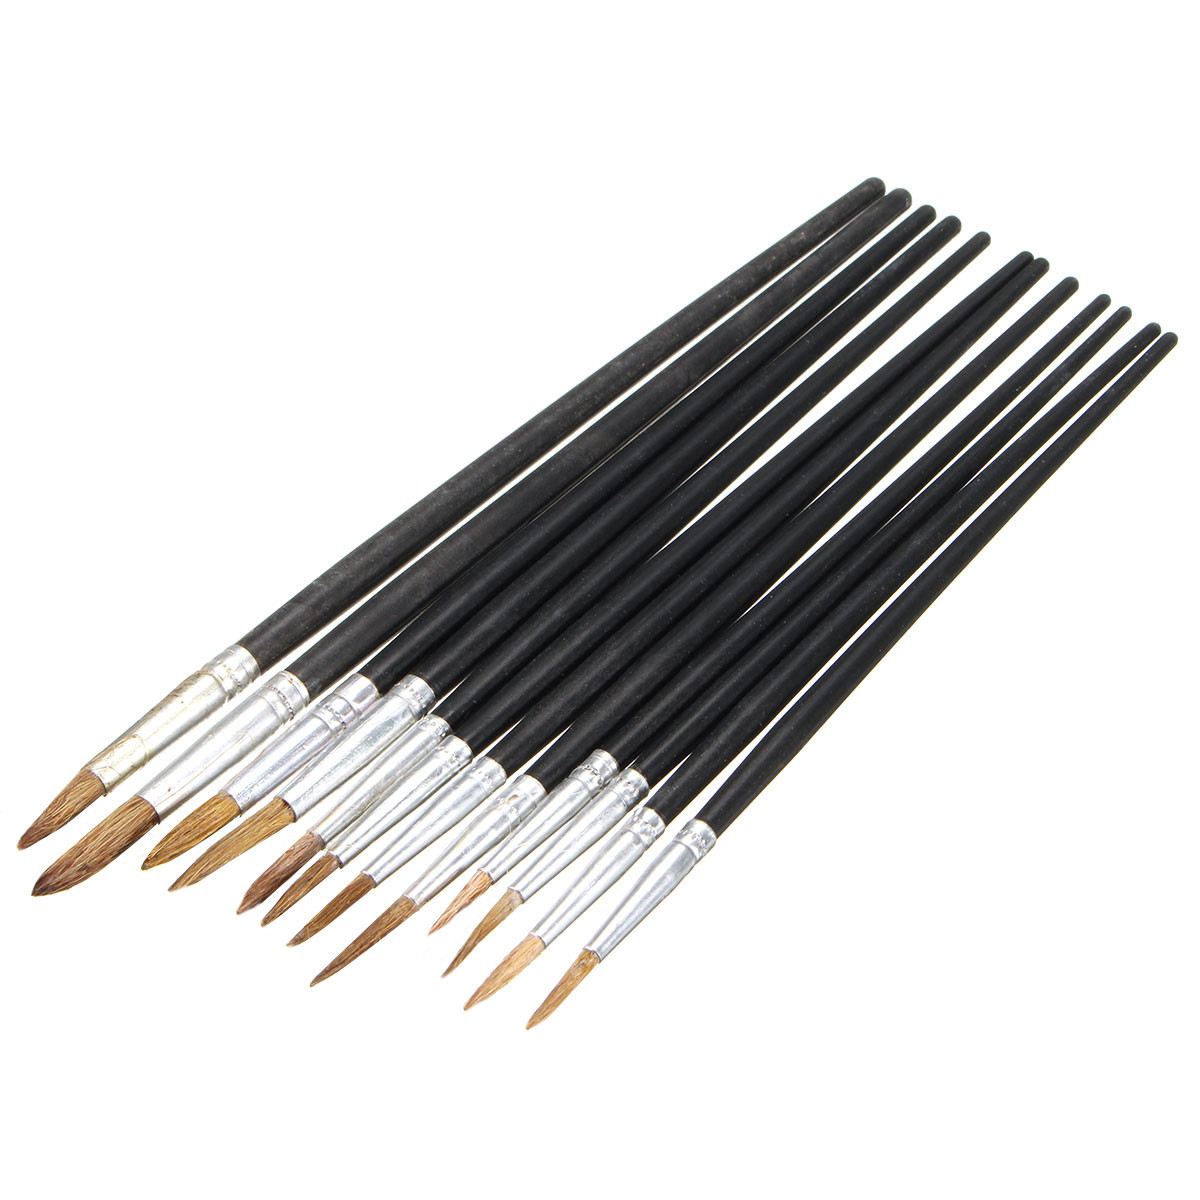 12 Black Pointed Artist Brush Set Small Large Art Paint